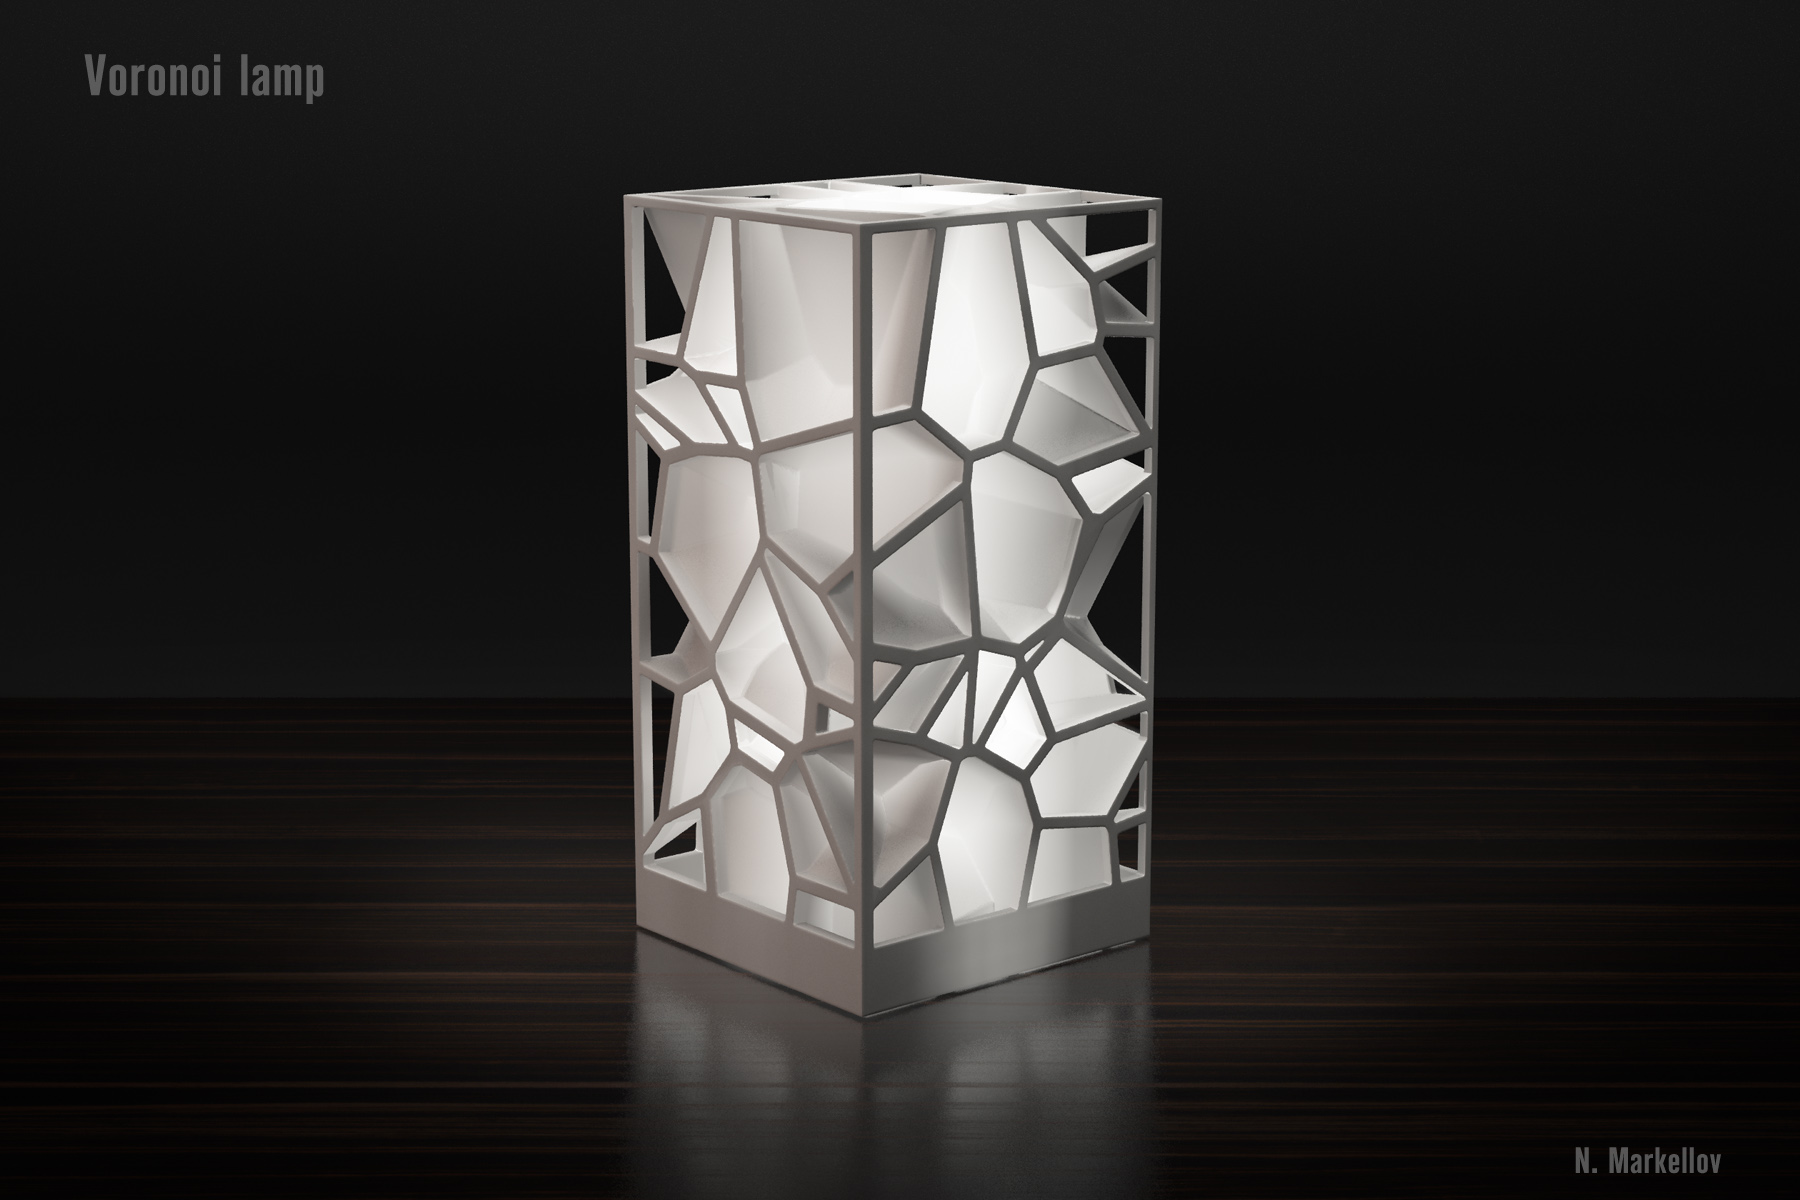 Voronoi lamp by Markellov - Thingiverse